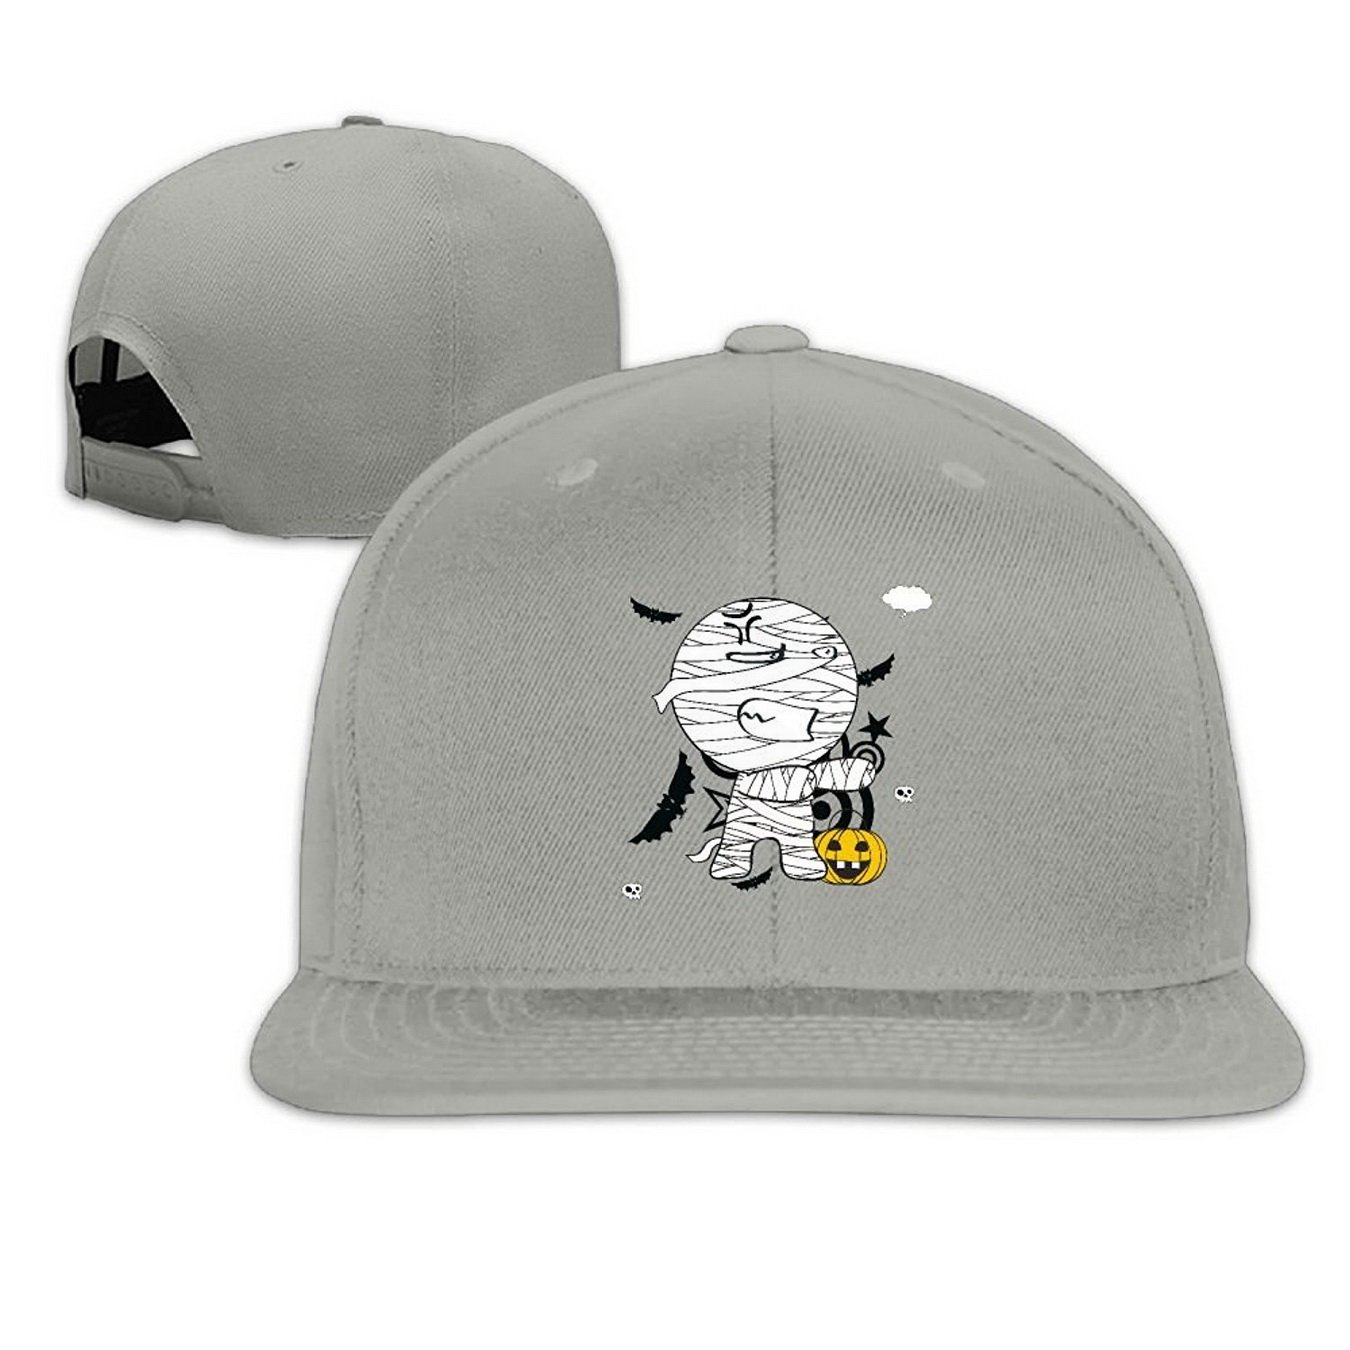 Unoopler Cute Funny Pumpkin Mummy Snapback Hip Hop Flat Bill Baseball Caps for Men Women Ash